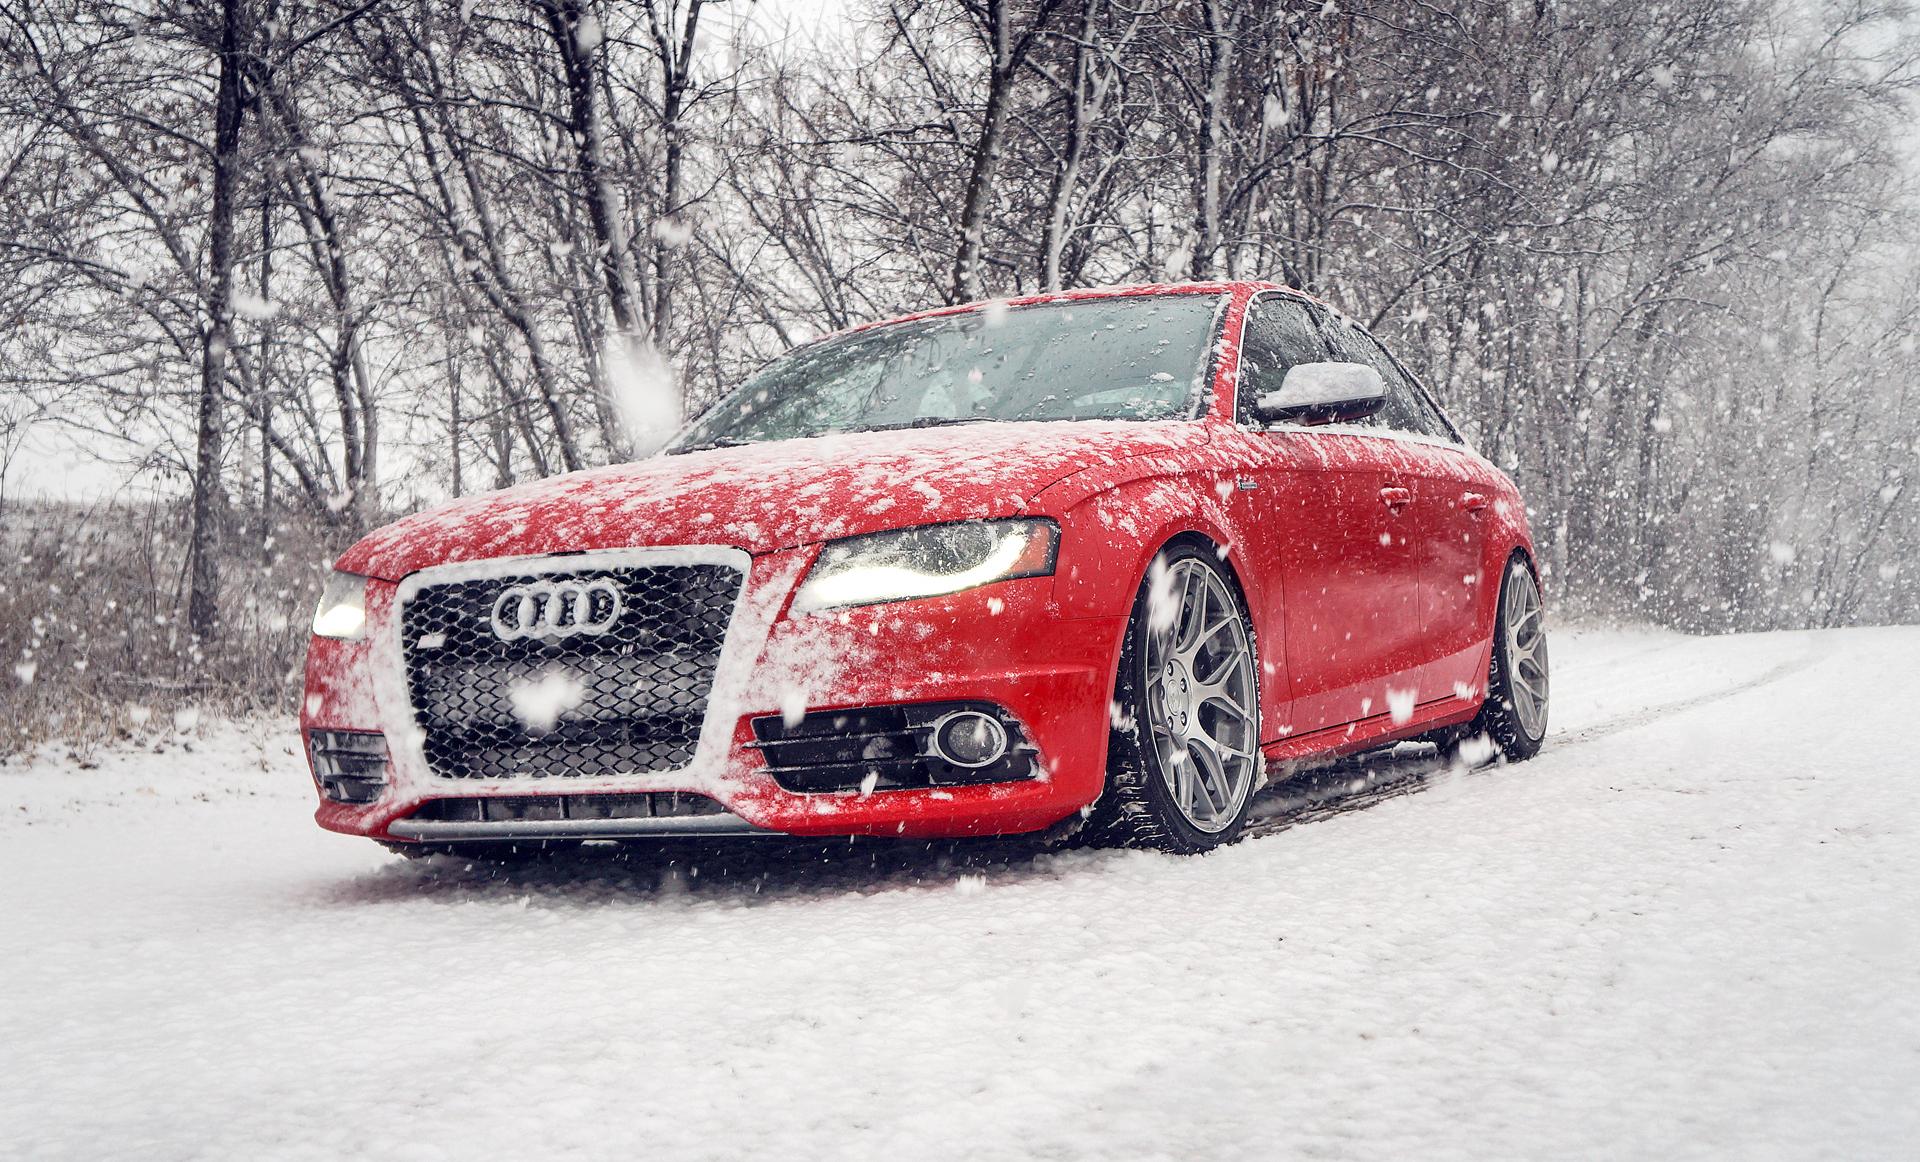 Audi S4 Hd Wallpaper Background Image 1920x1162